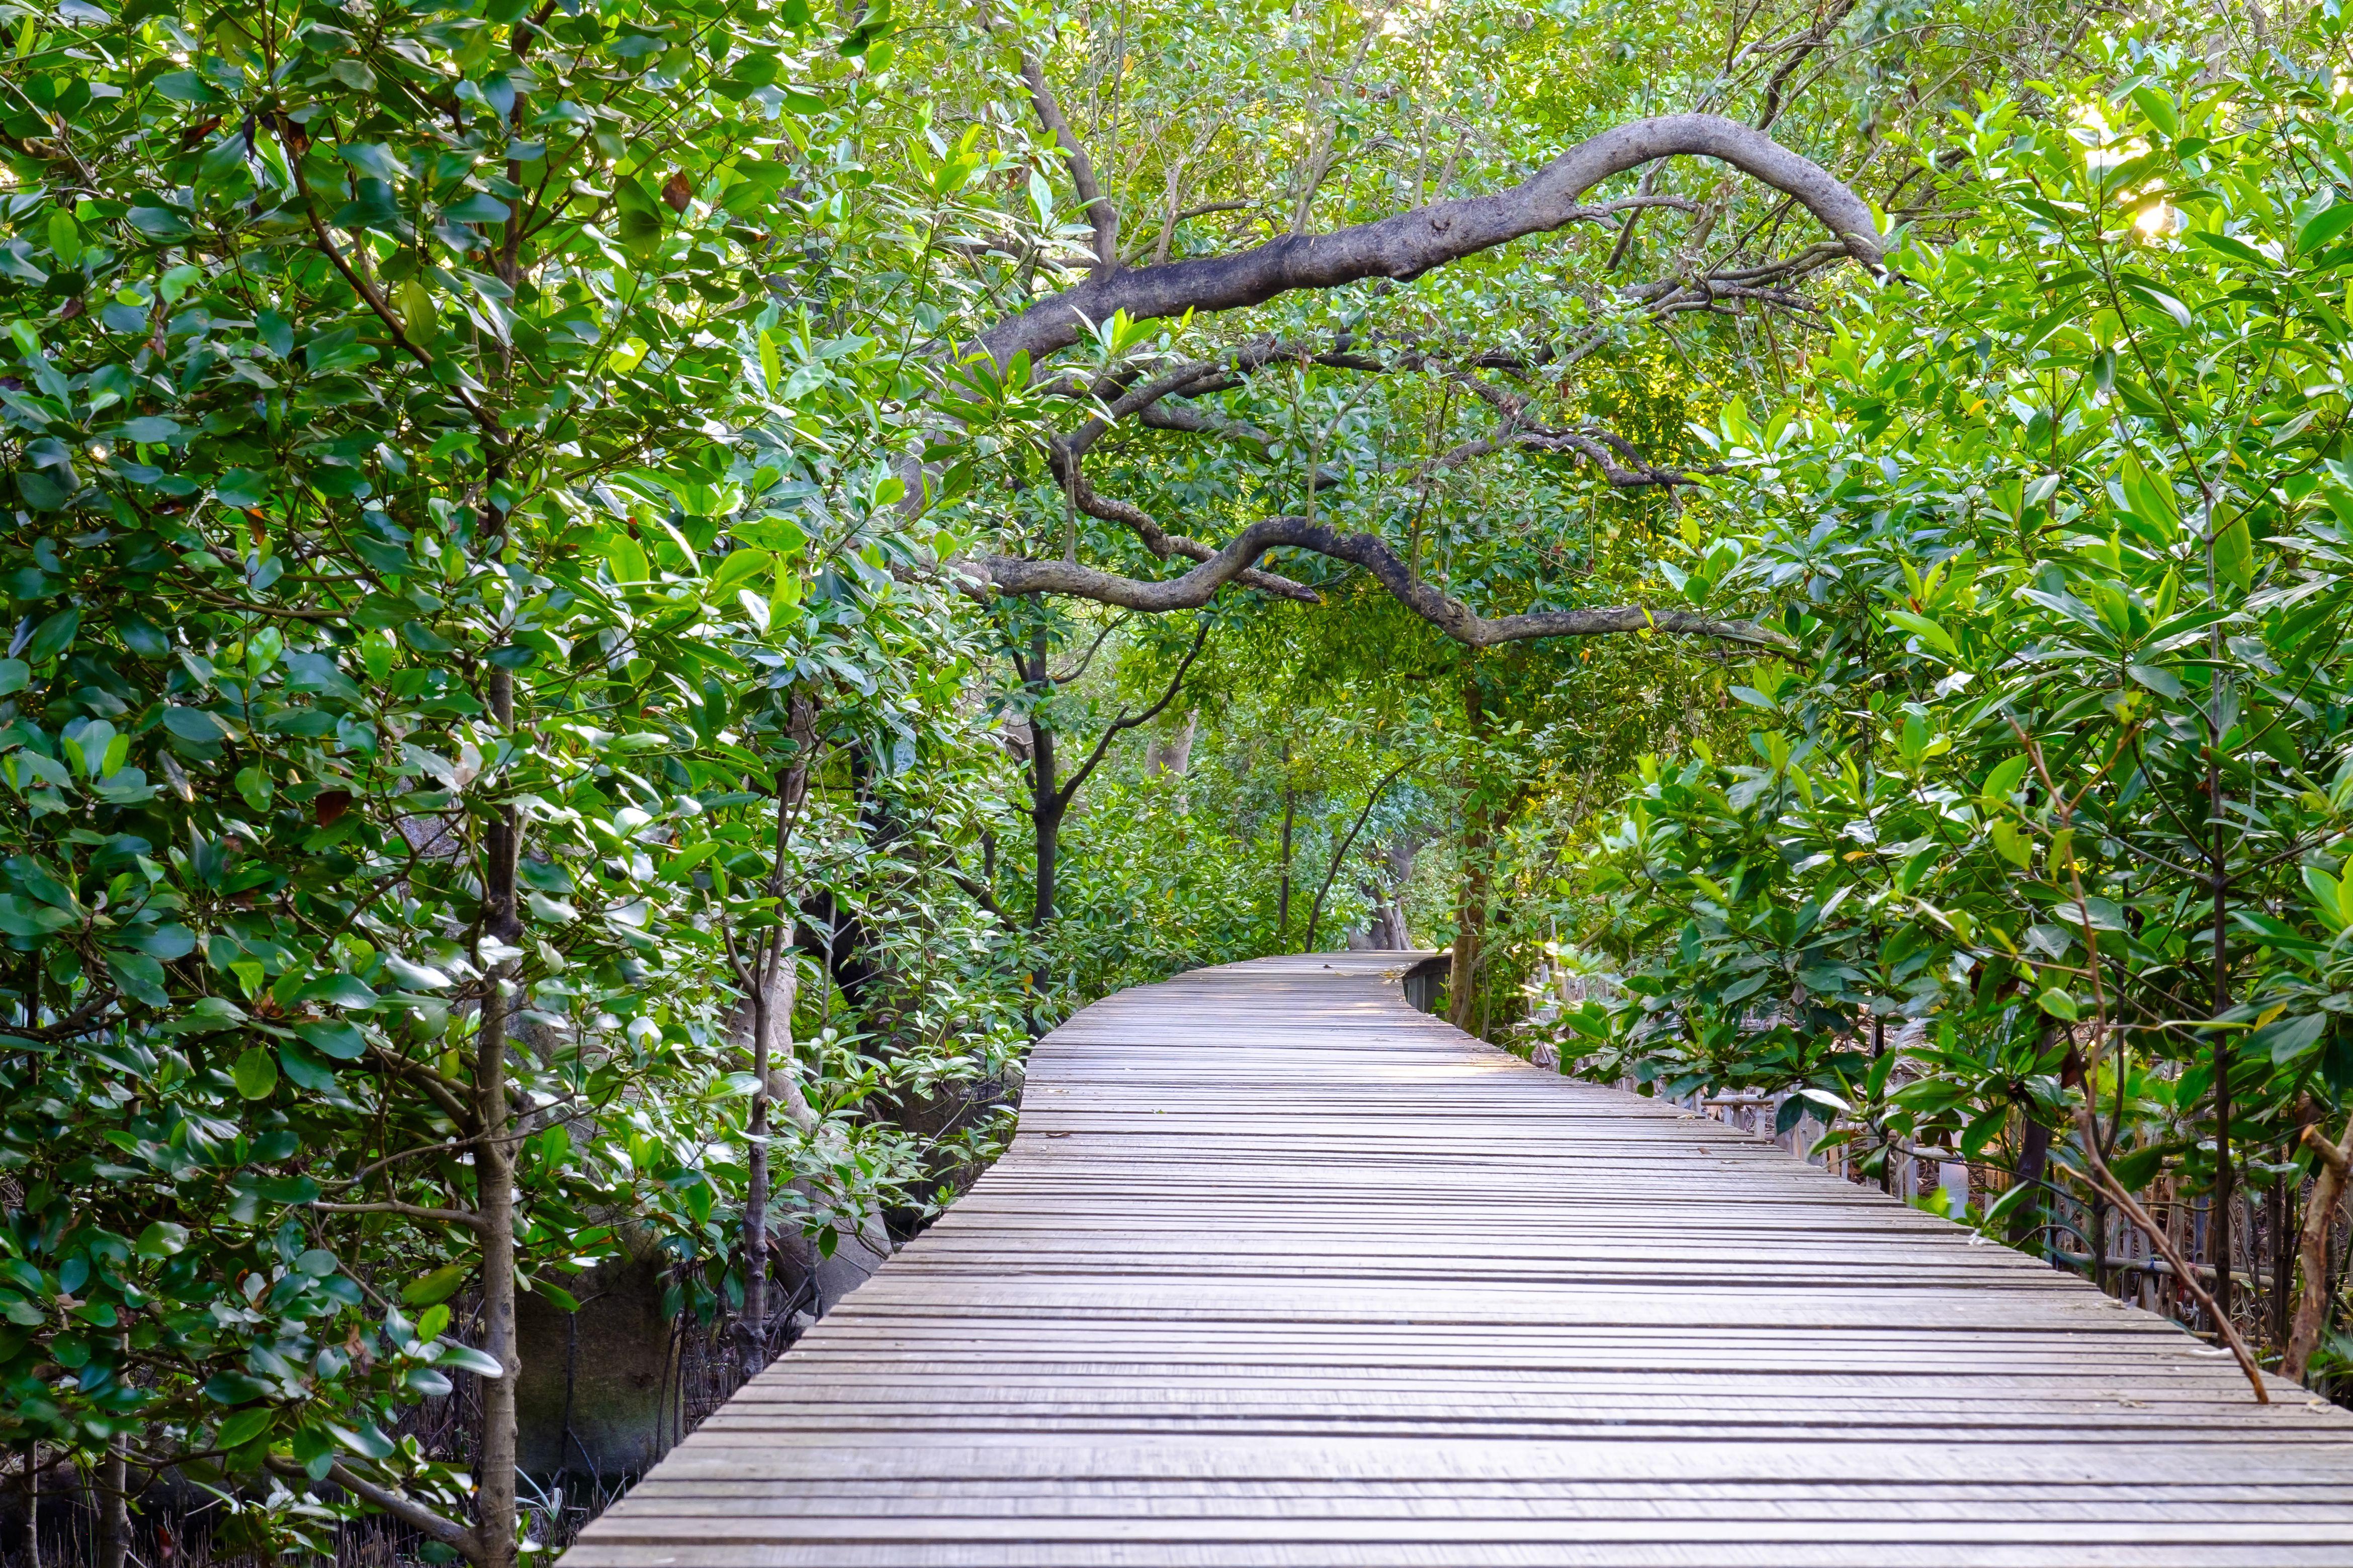 A walkway through mangroves in Rayong, Thailand